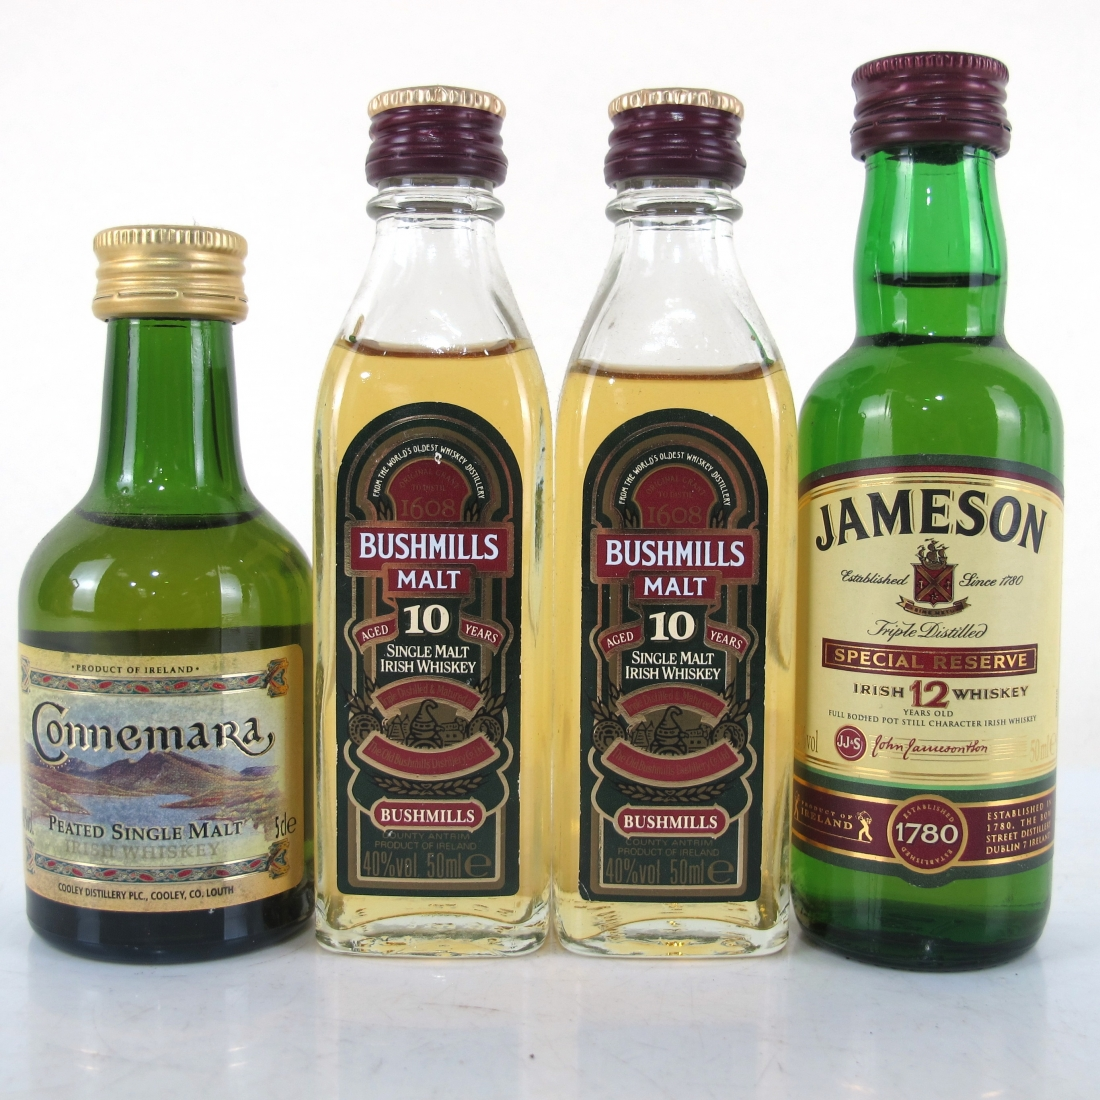 Irish Whisky Miniature Selection 4x 5cl / Including Connemara Peated